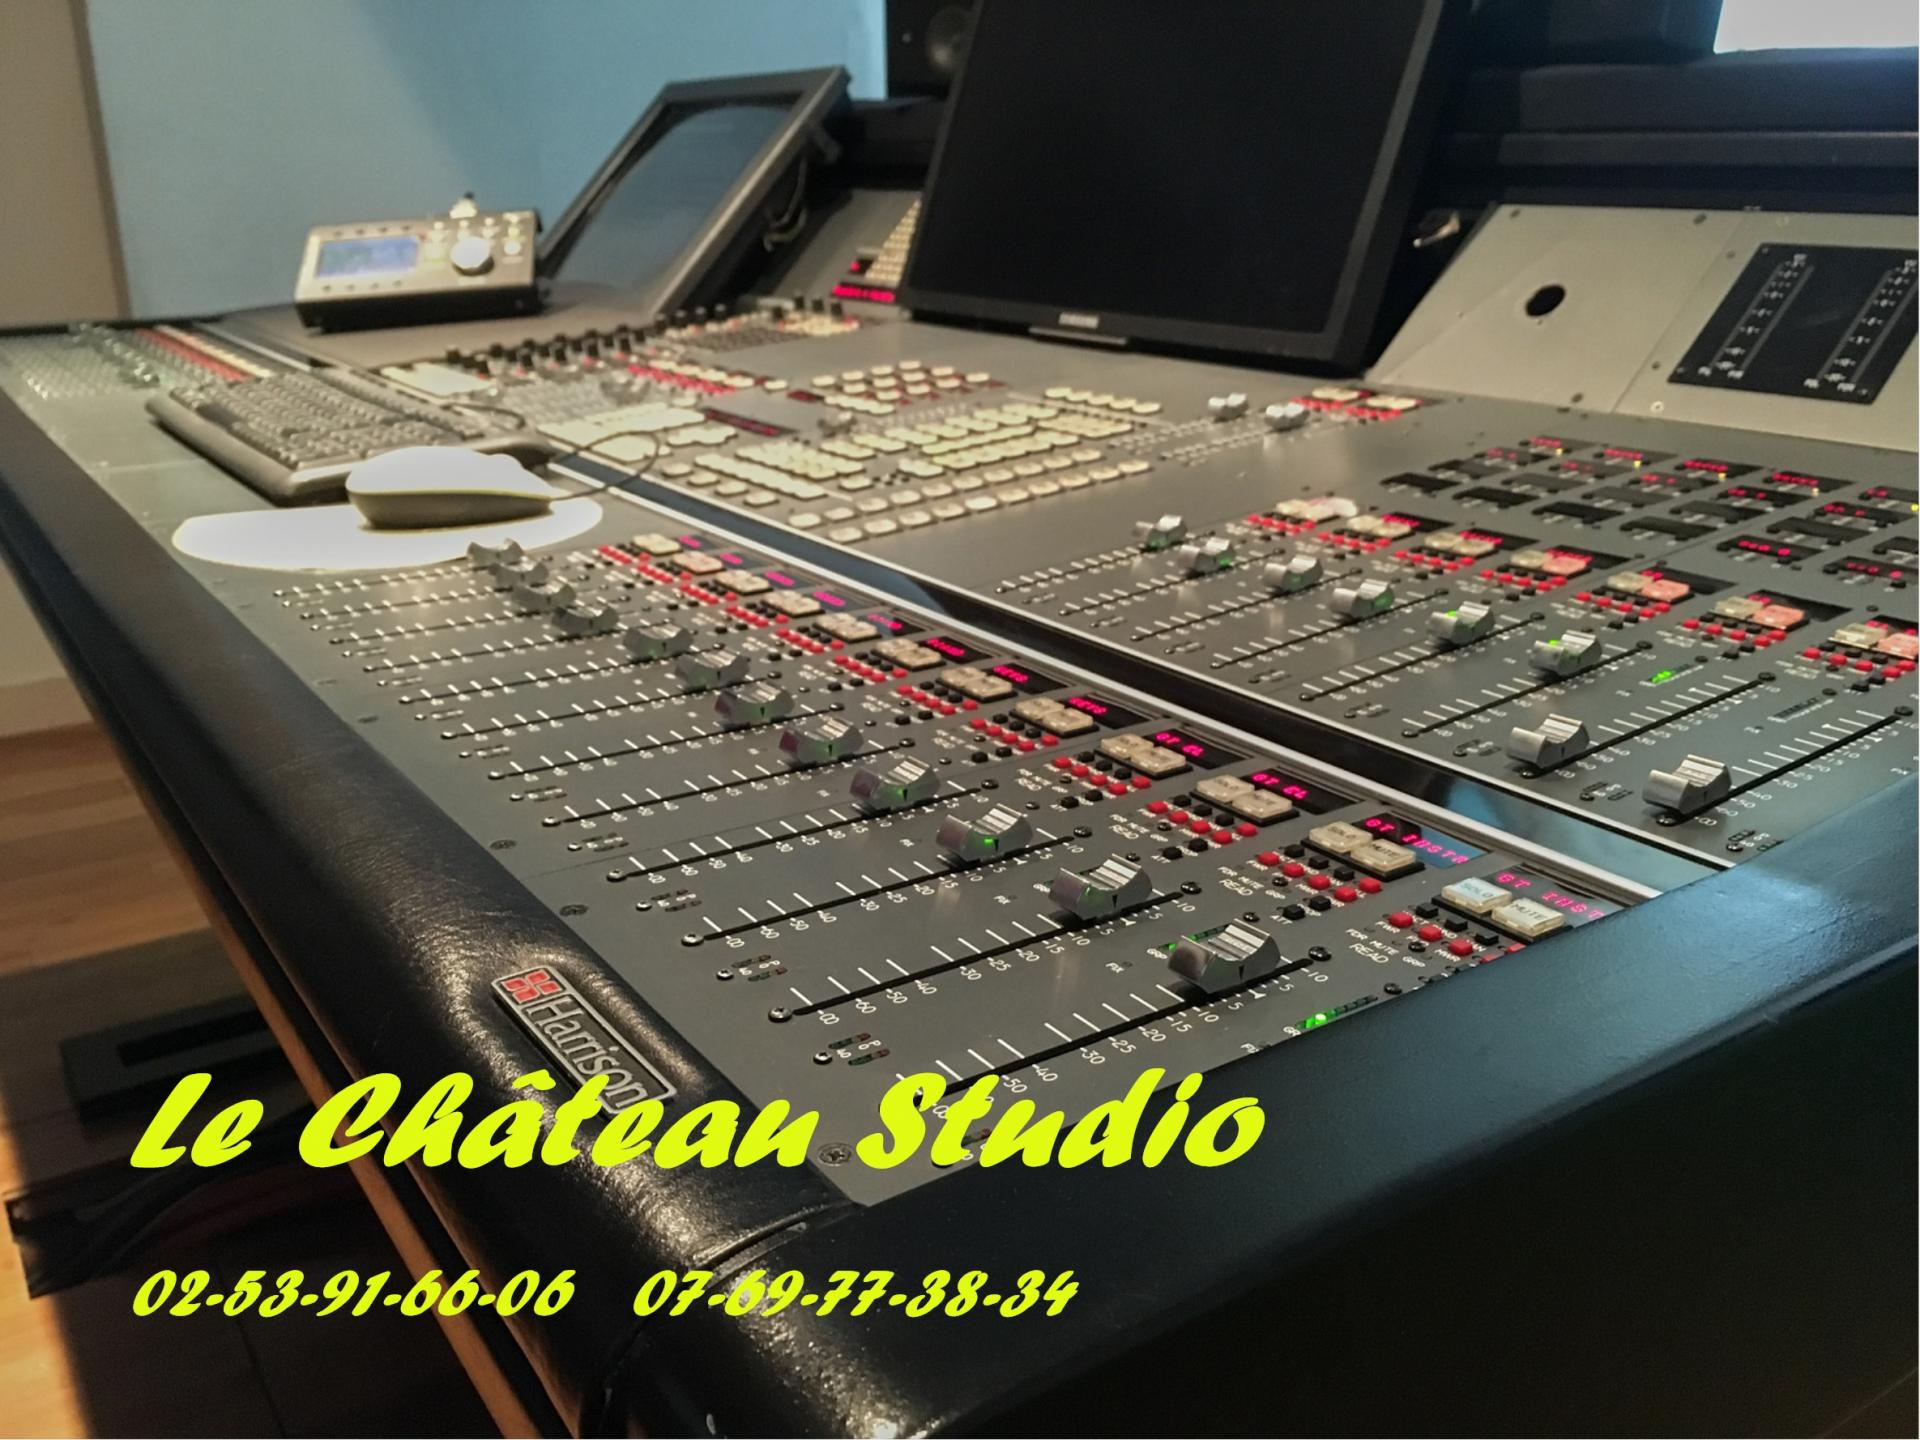 Le Château Studio